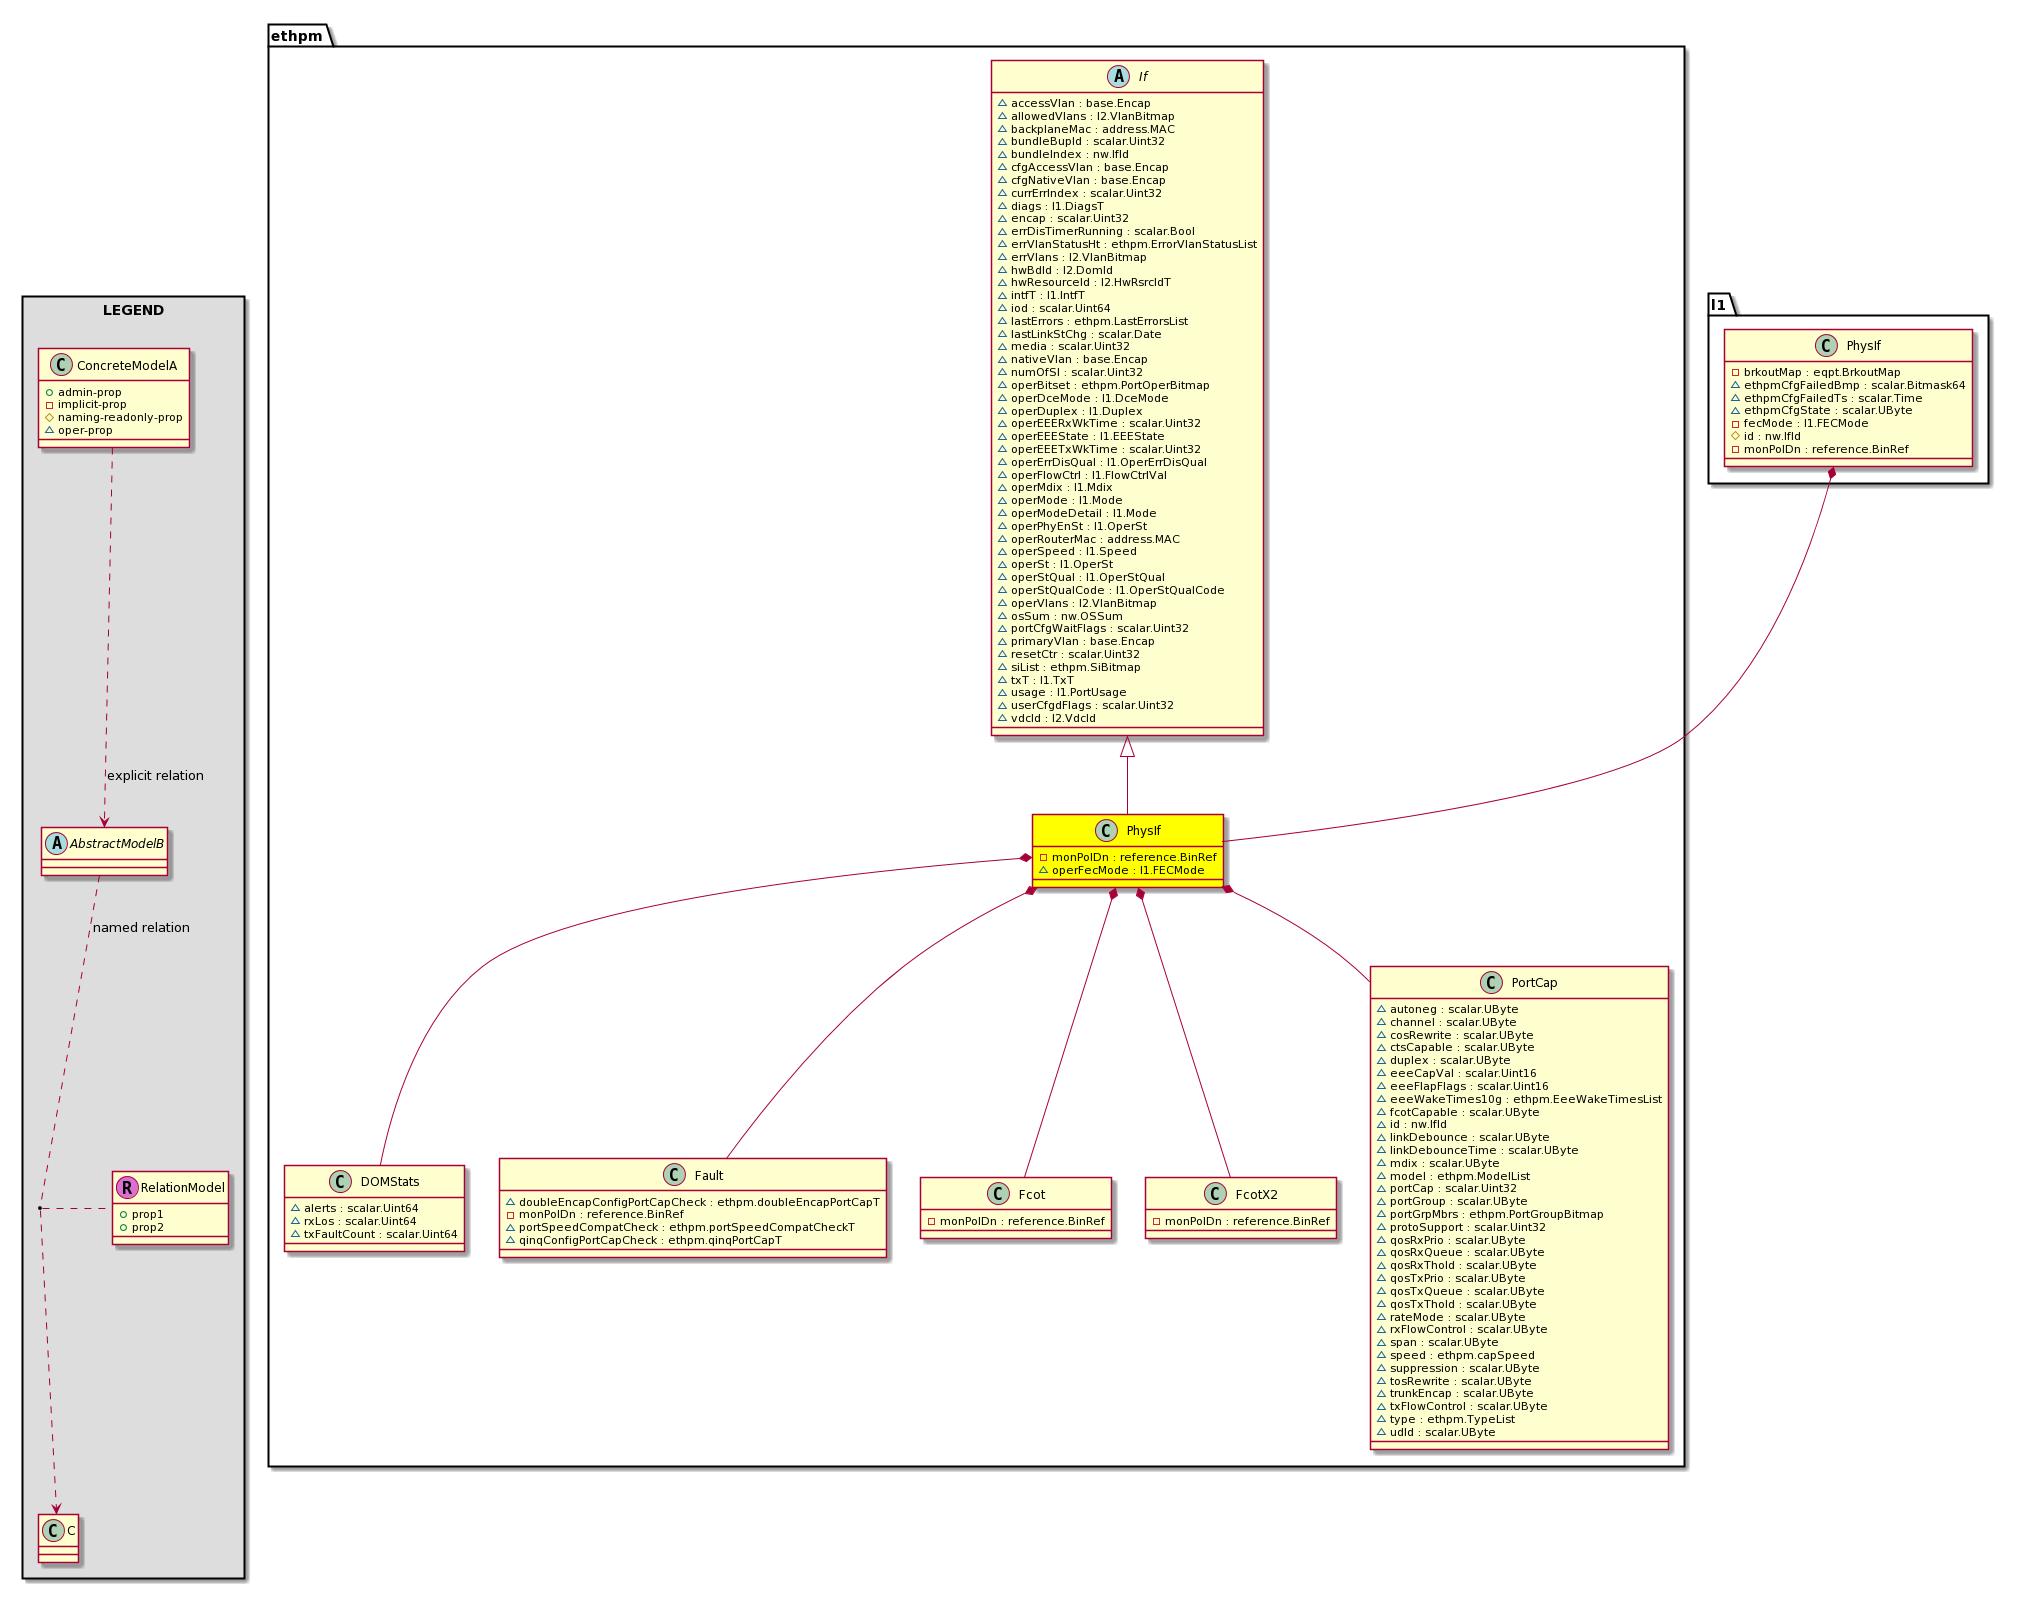 Cisco System Model: Classethpm:PhysIf